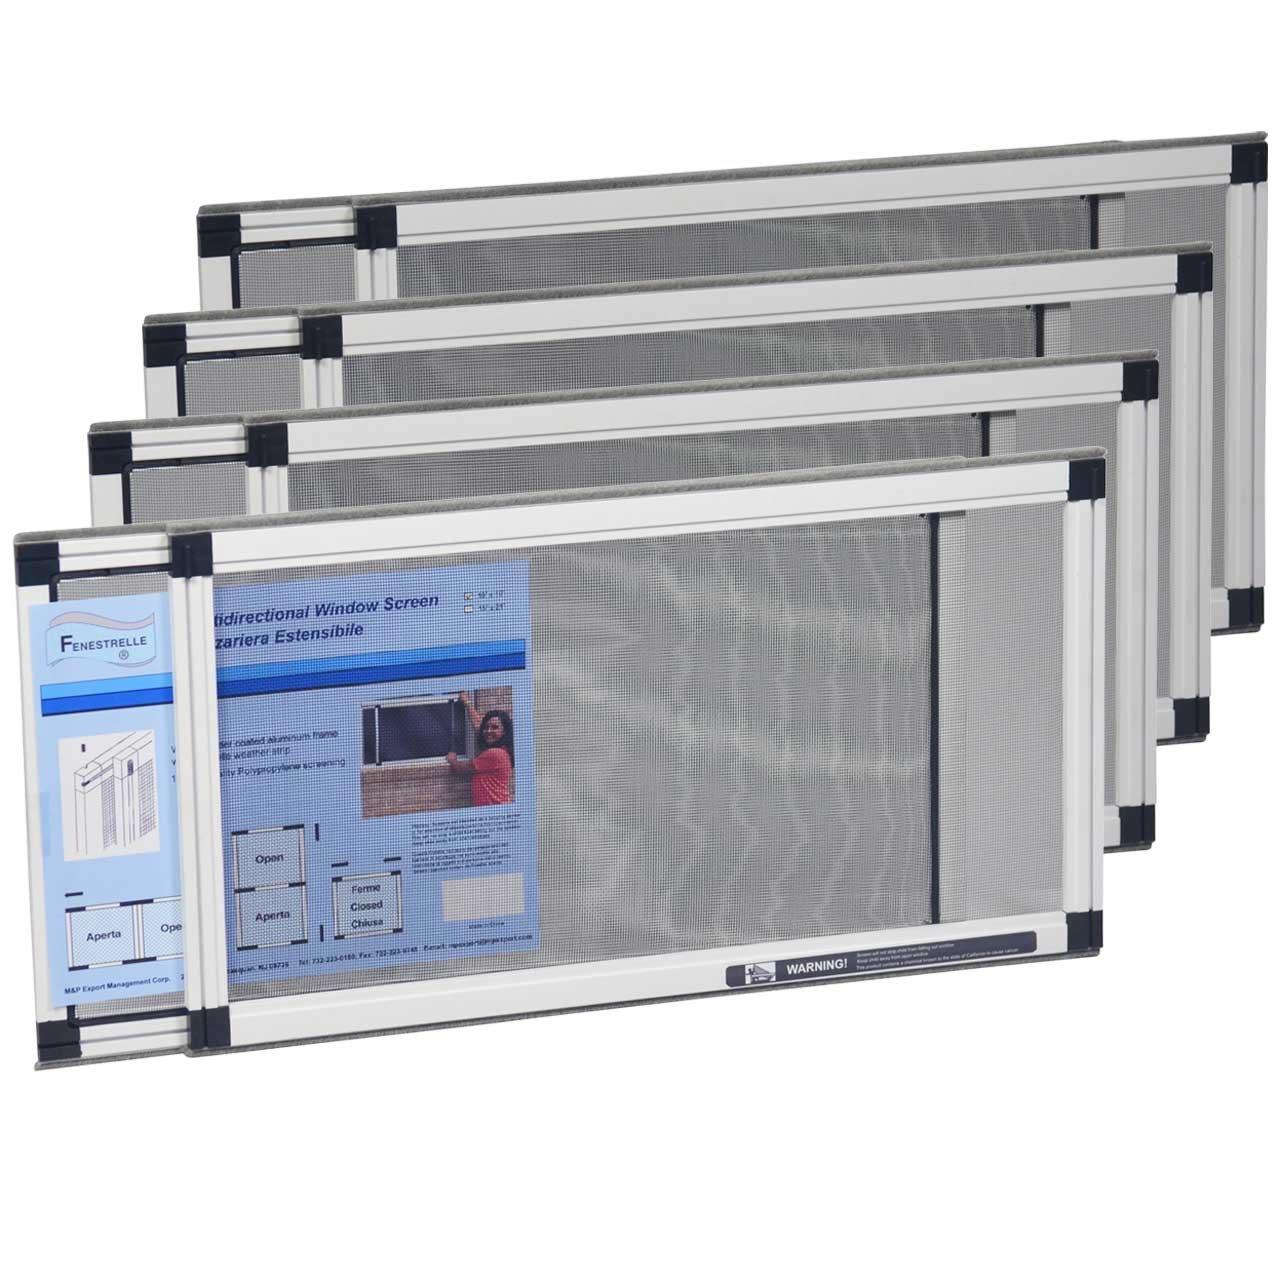 Fenestrelle Adjustable Window Screen, 2 Way Adjustable, Horizontal, (10''x19-36''w) or Convert to Vertical (19''x10-18''w) - 4 Pack